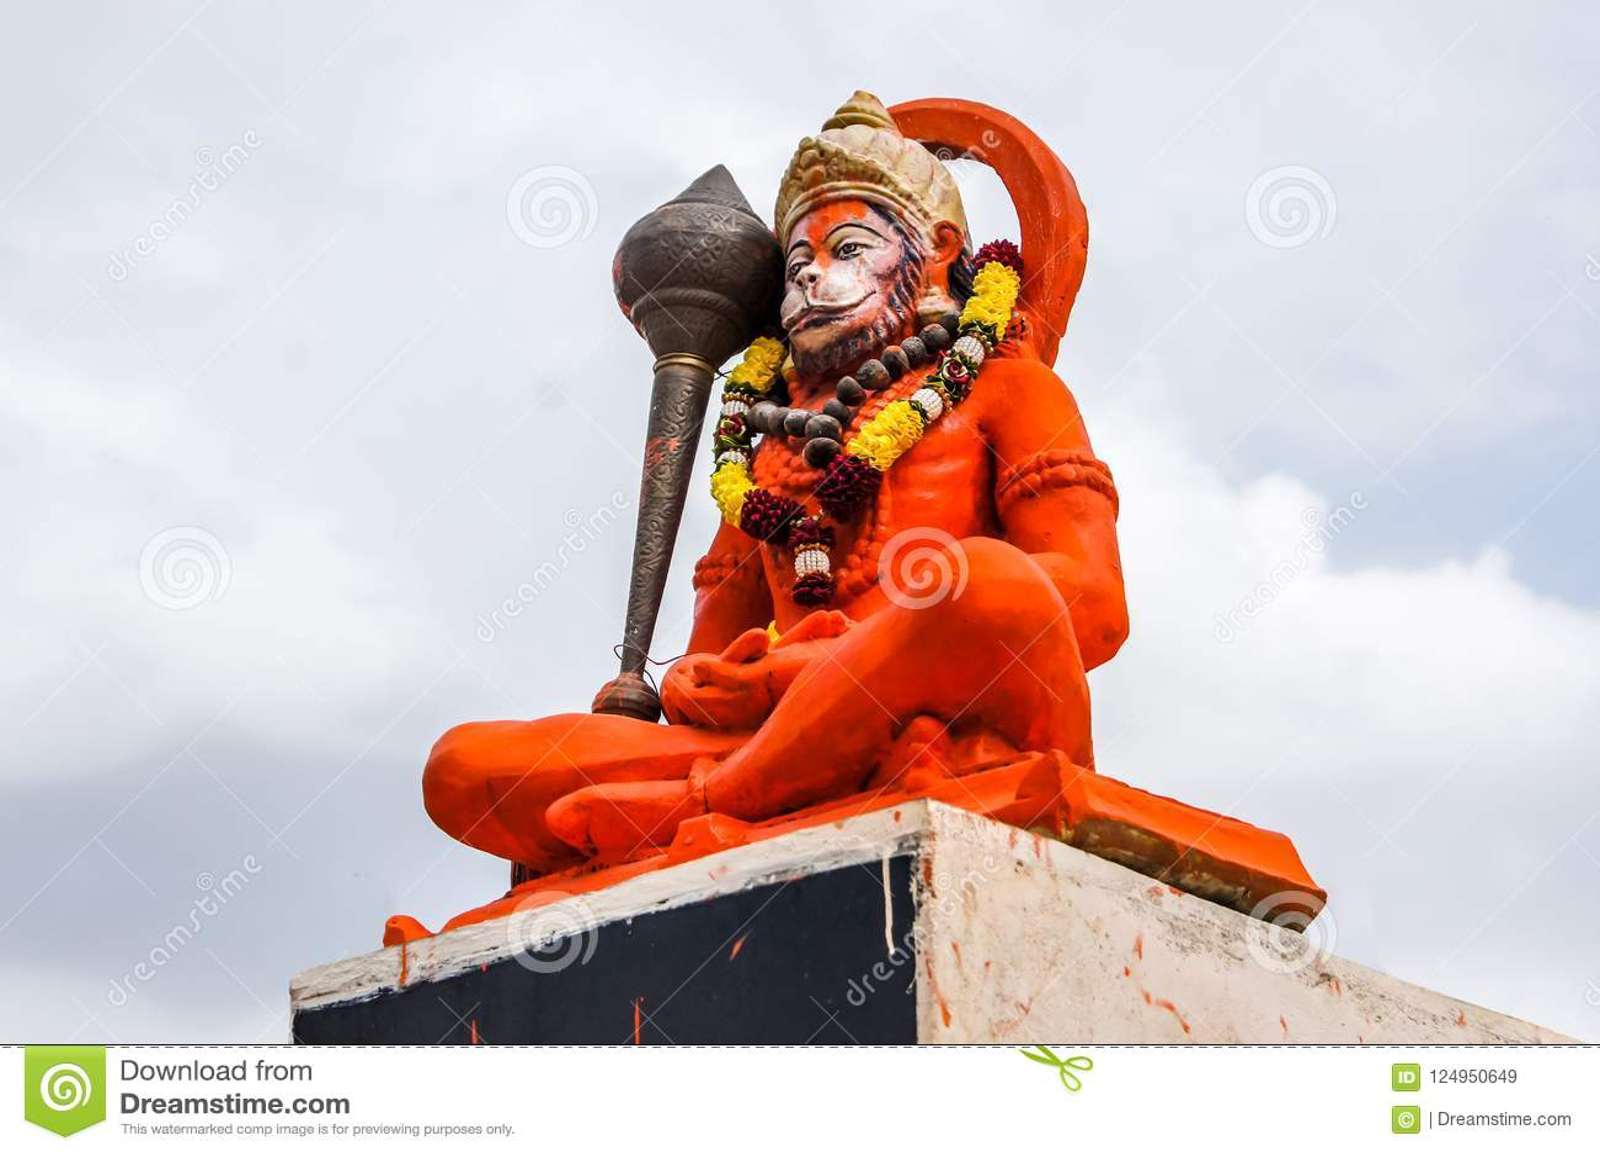 Ídolo hindu de Hanuman do deus, estátua enorme do senhor indiano Hanuman